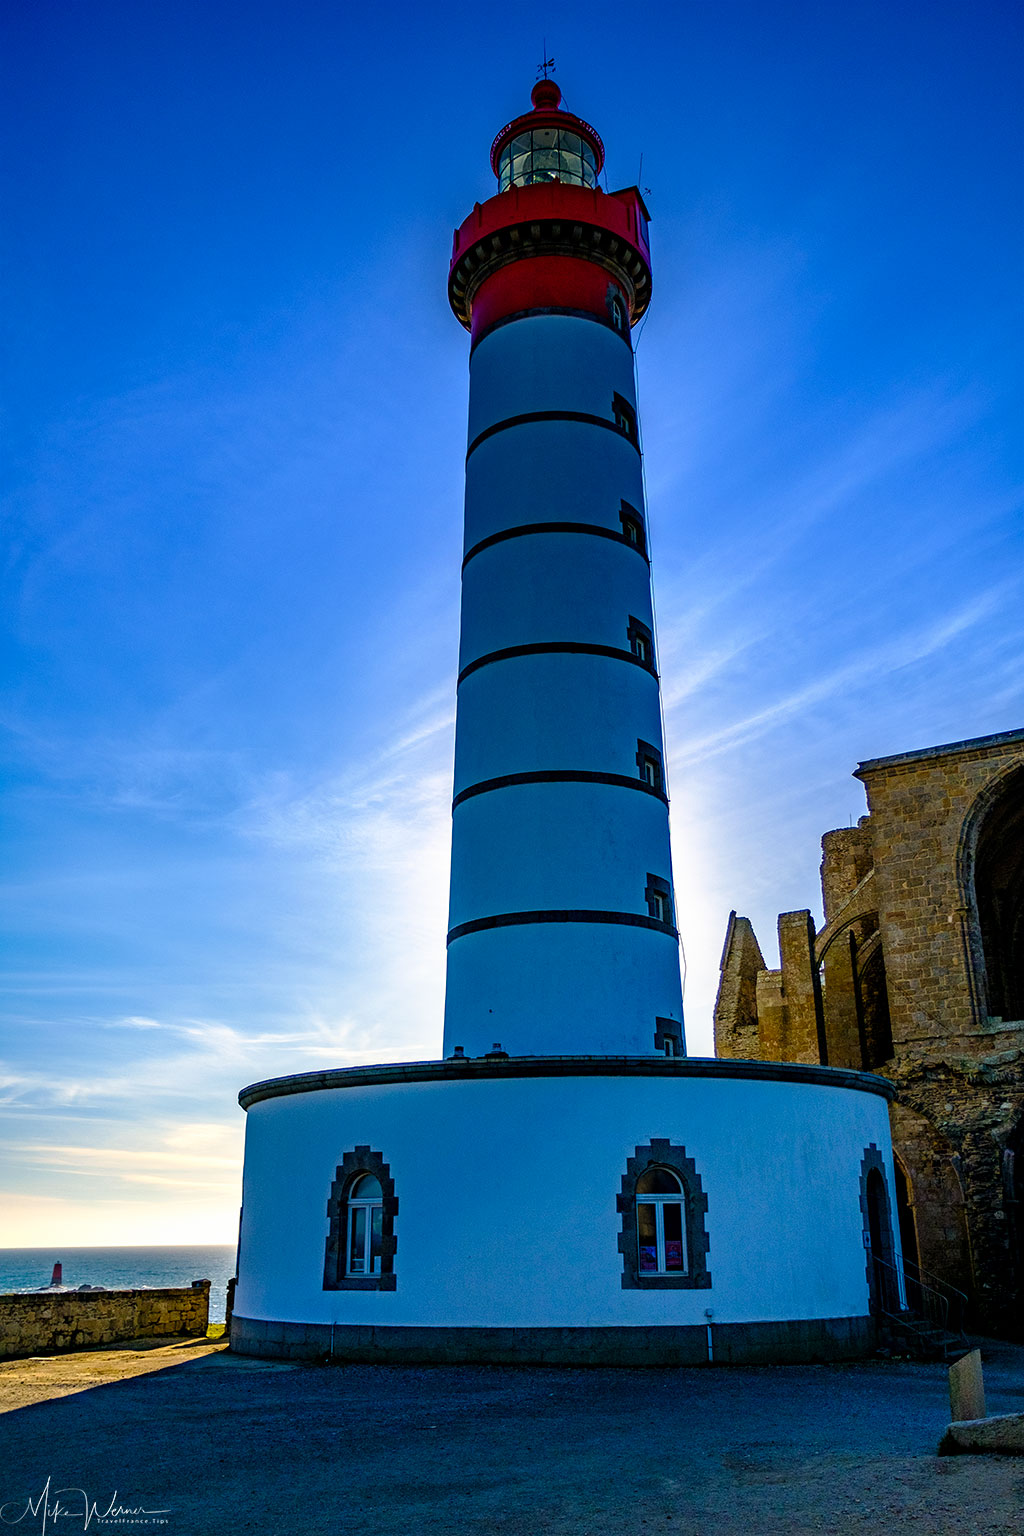 The lighthouse of Pointe Saint-Mathieu